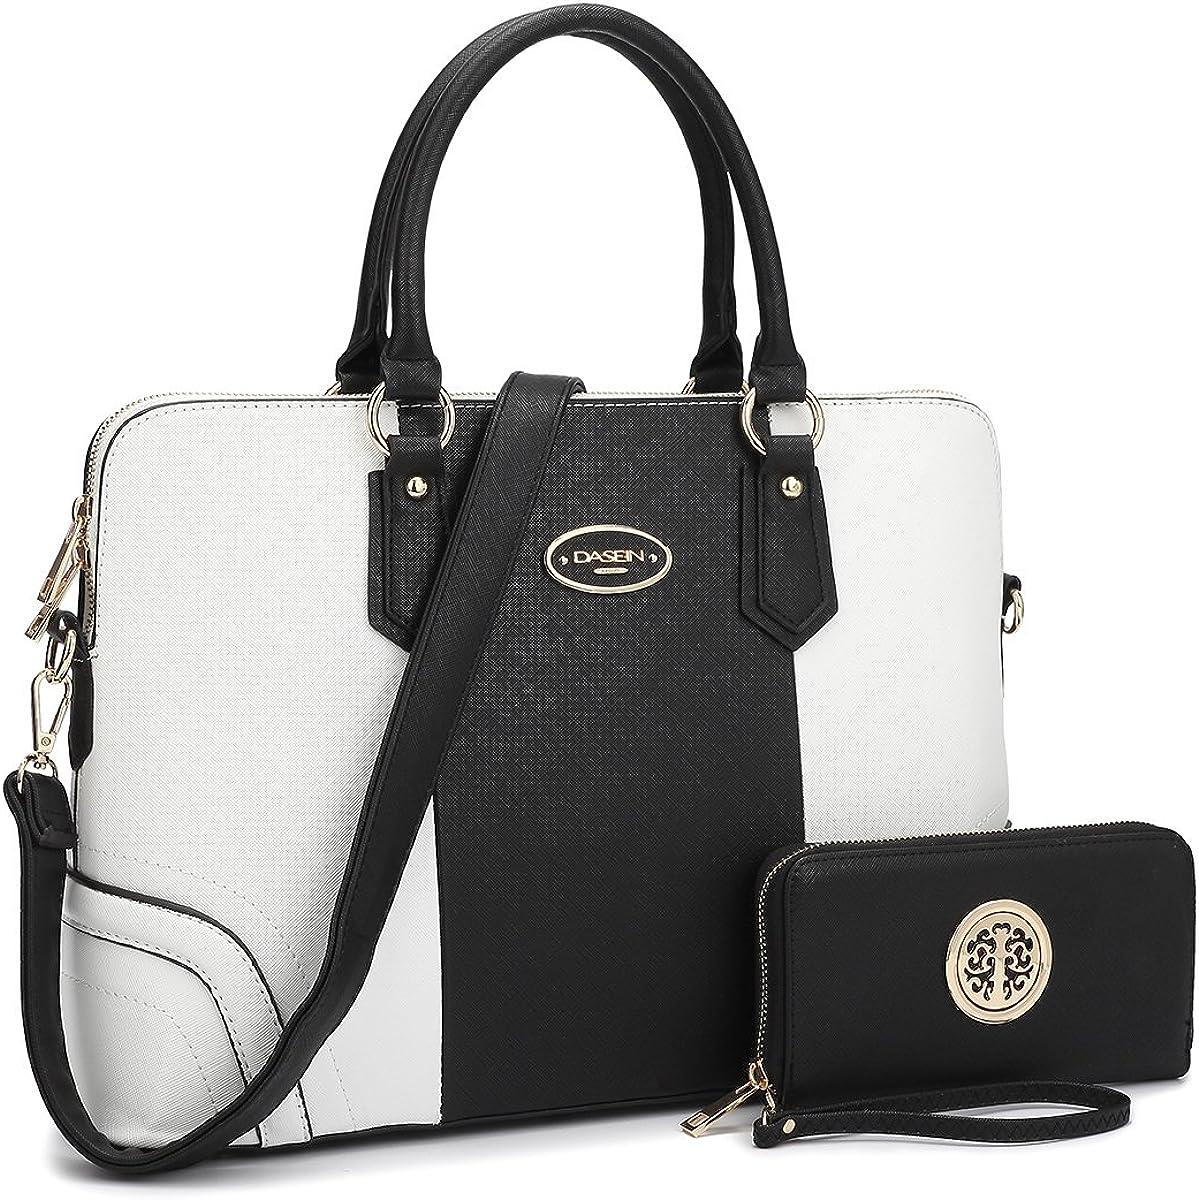 Dasein Satchel Handbags...